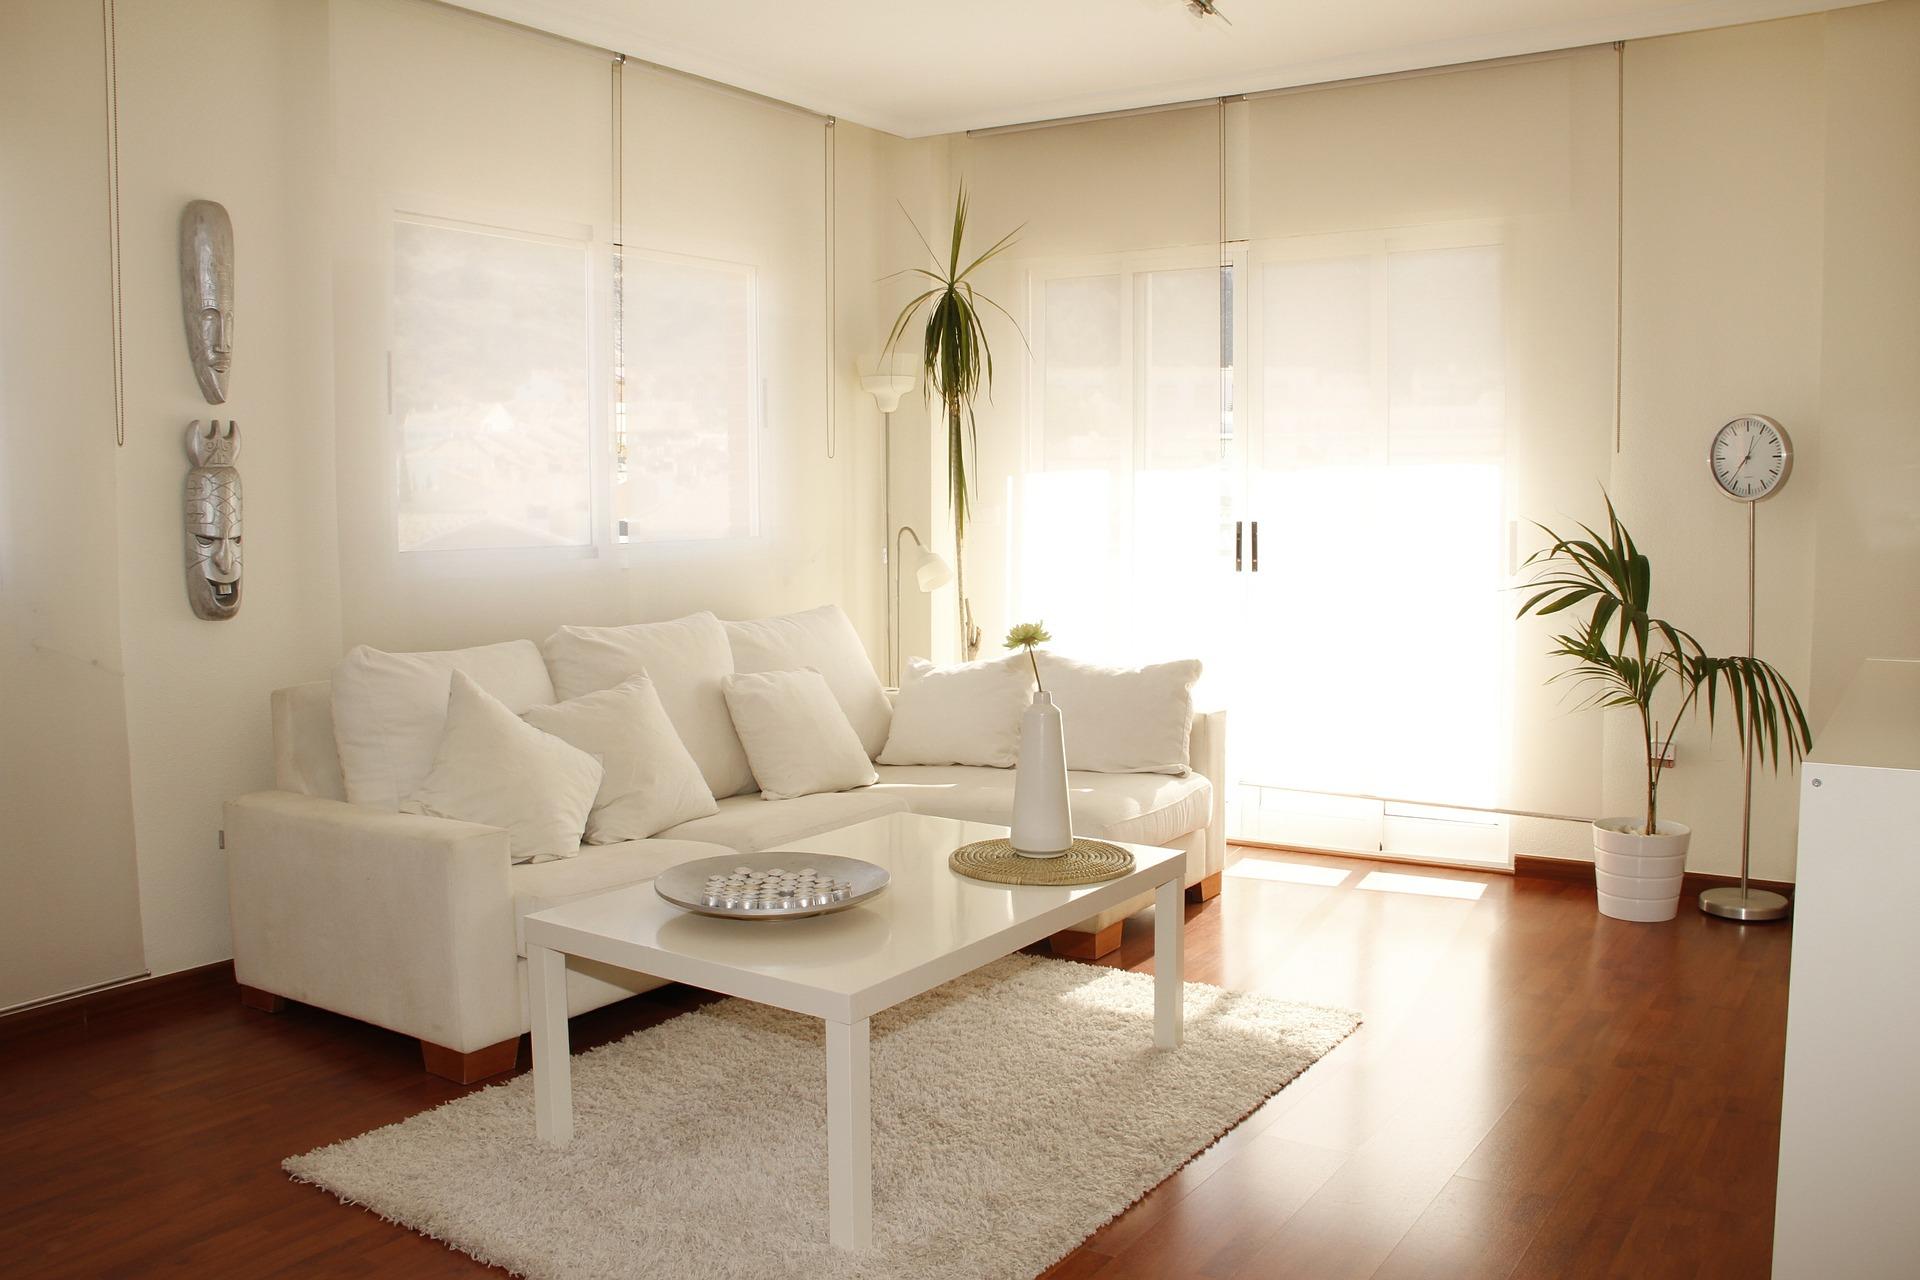 living-room-421842_1920